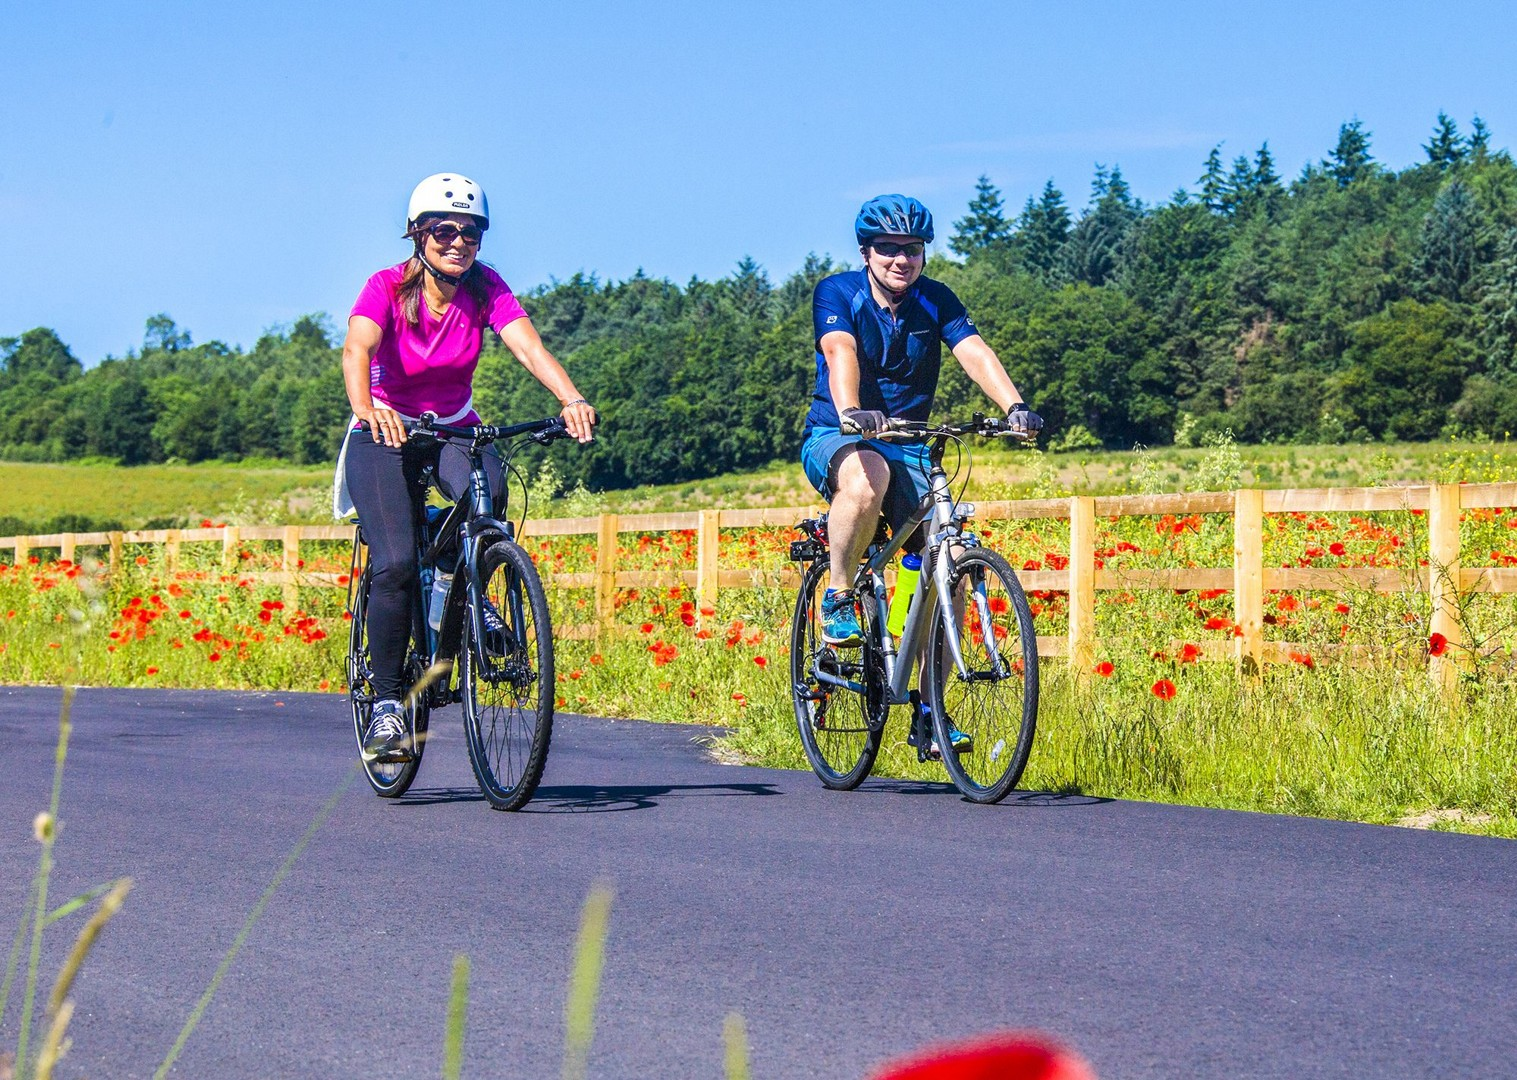 1906_0466-2.jpg - UK - Hadrian's Cycleway - 4 Days Cycling - Self-Guided Leisure Cycling Holiday - Leisure Cycling